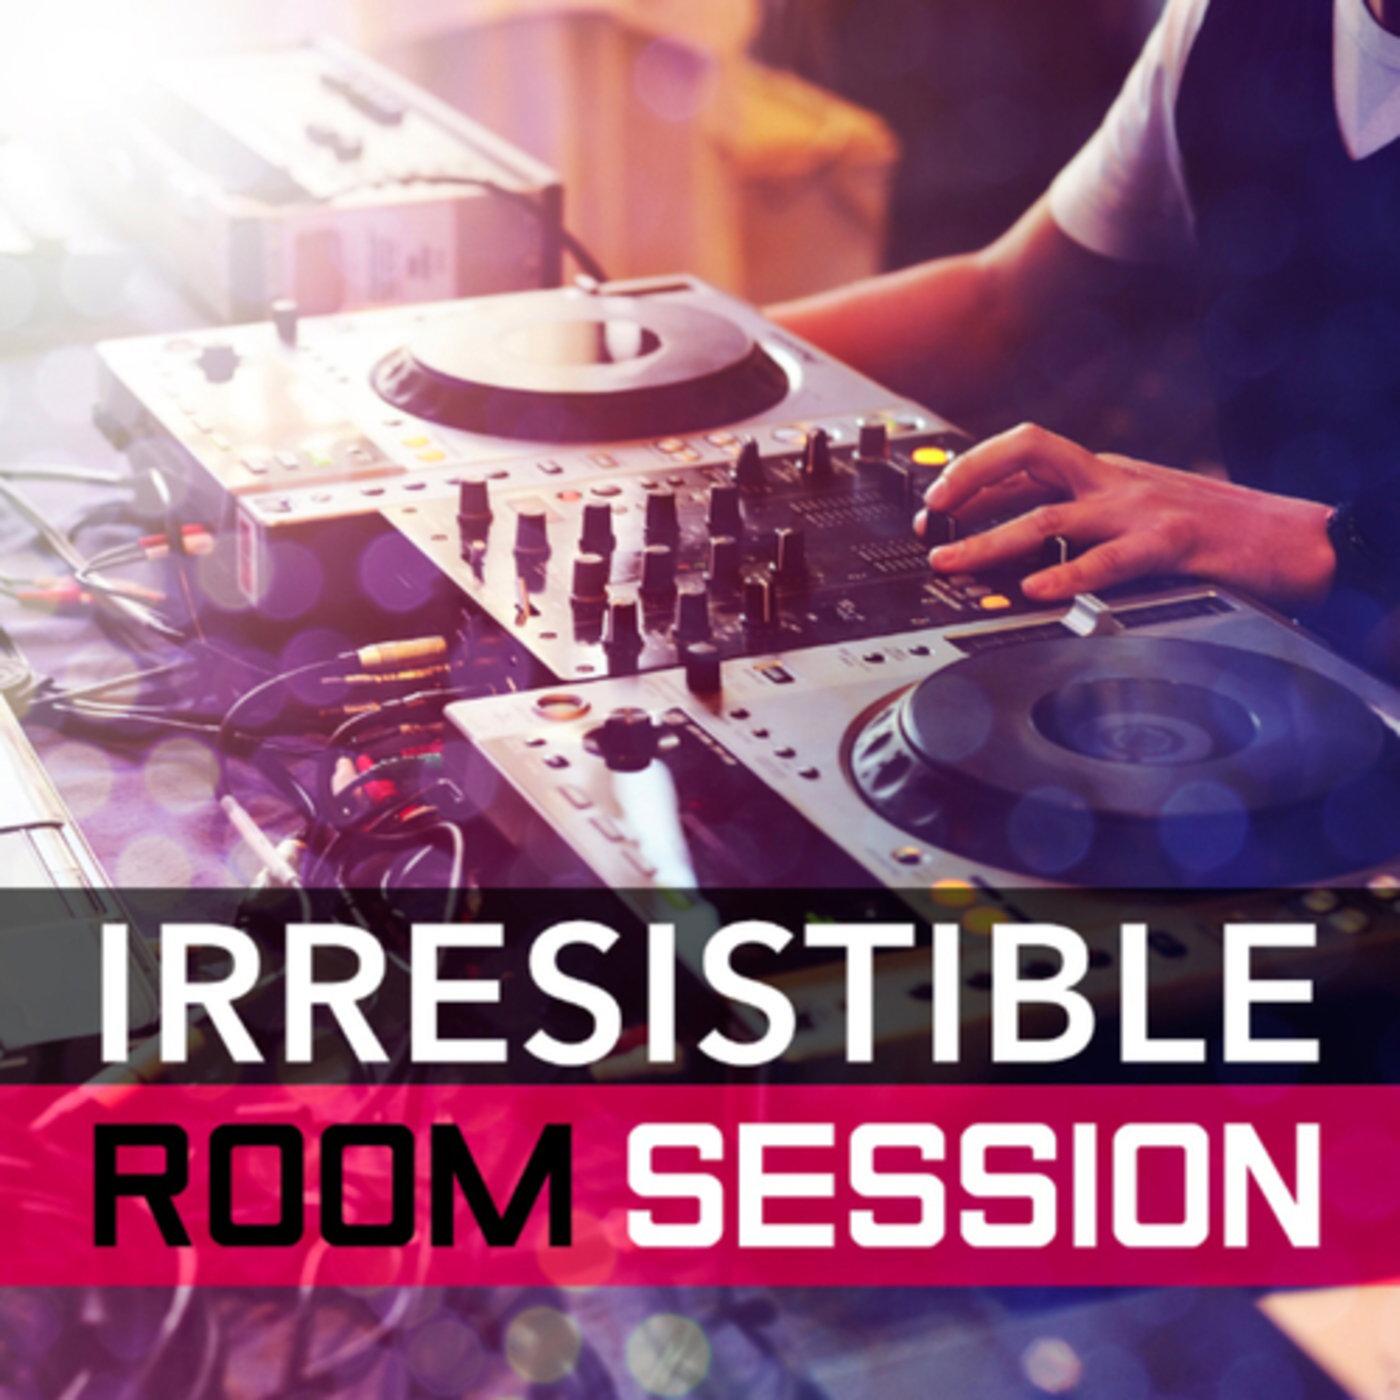 <![CDATA[Irresistible Room | Session]]>